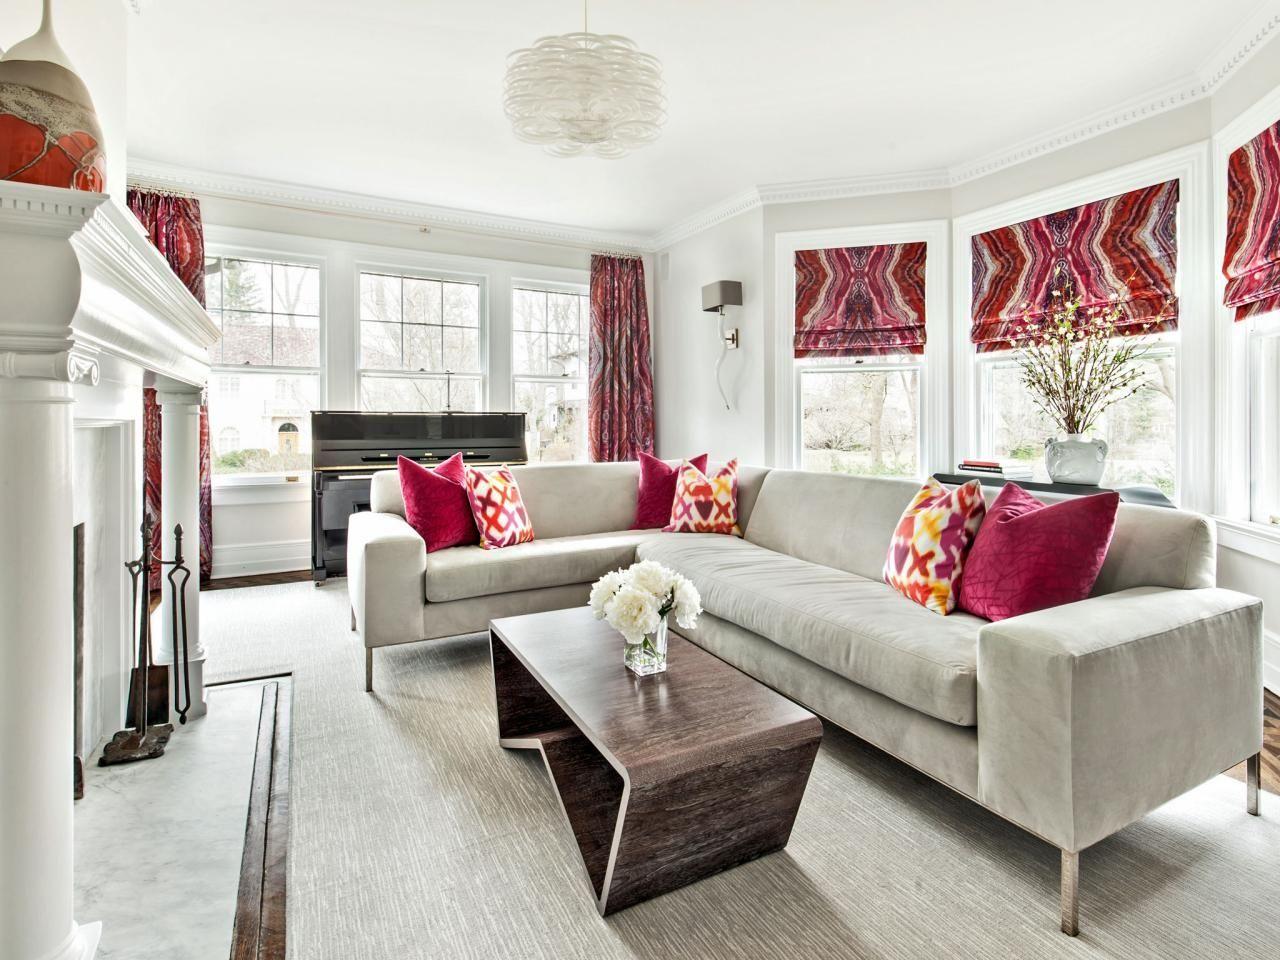 Living Room Decorations 2017 | http://club-maraton.com | Pinterest ...